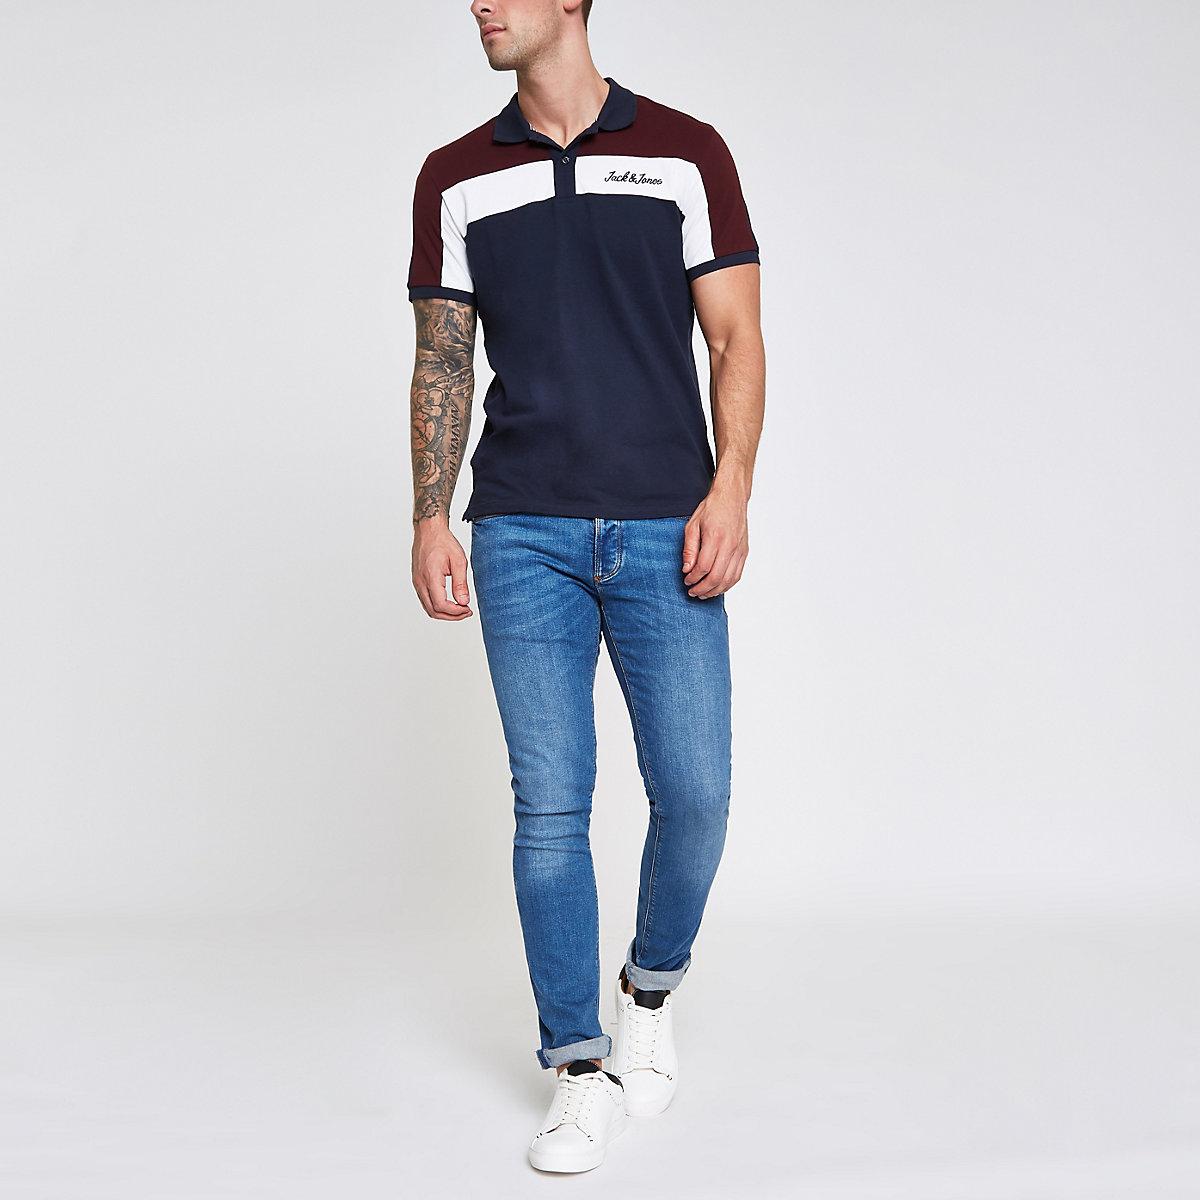 Jack & Jones navy color block polo shirt